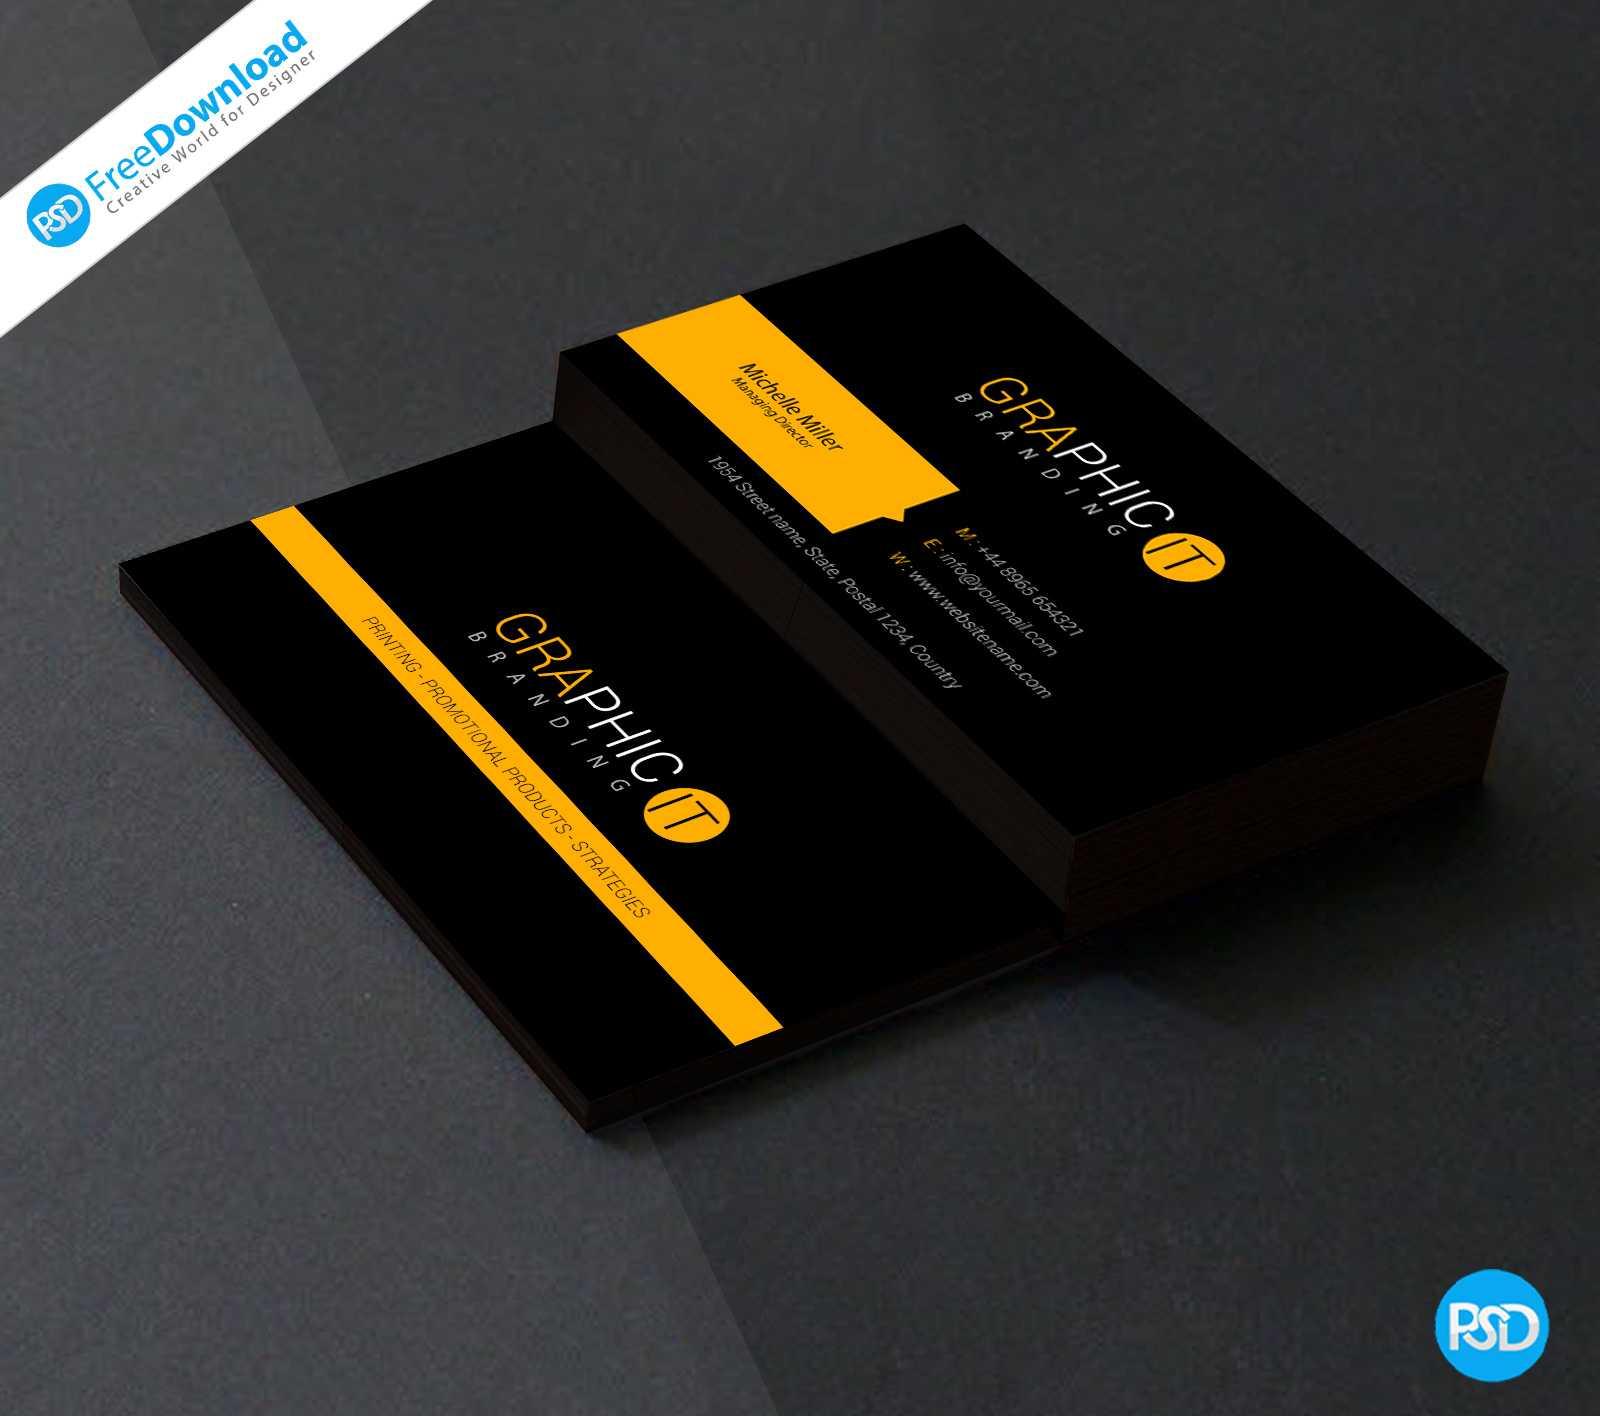 150+ Free Business Card Psd Templates throughout Name Card Design Template Psd